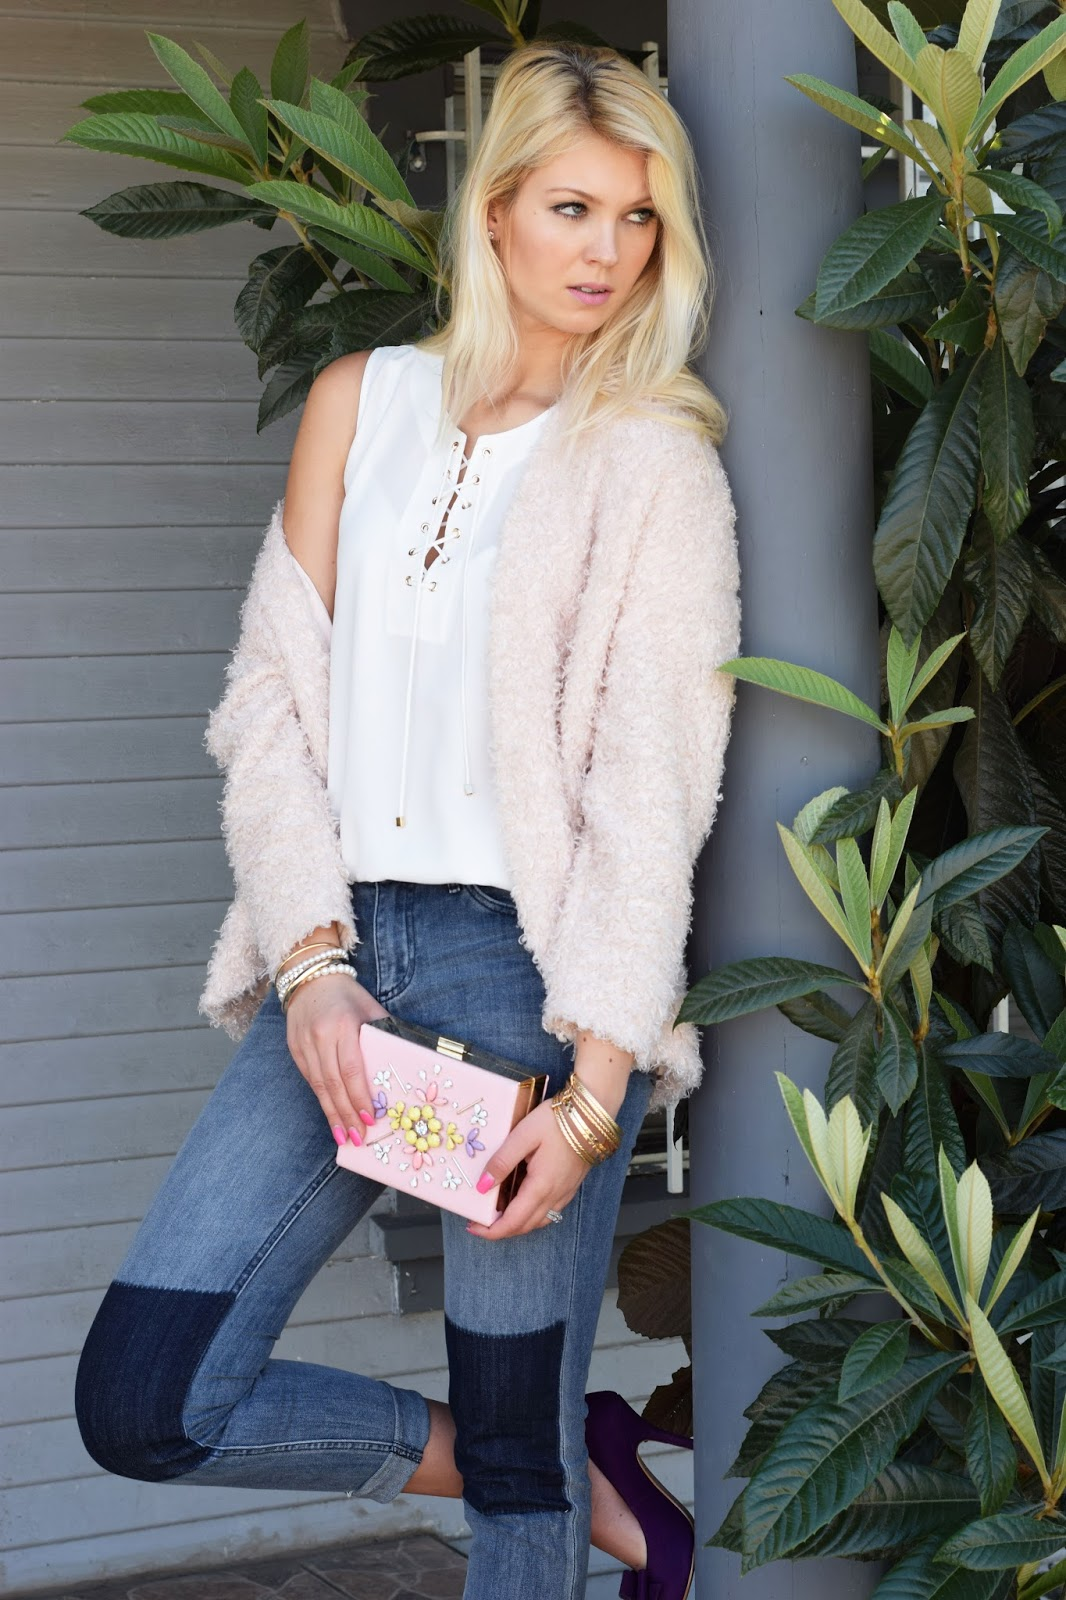 fluffly jacket, heels, rose, nicole lee, nicole lee clutch, pink clutch, purple heels, jeans